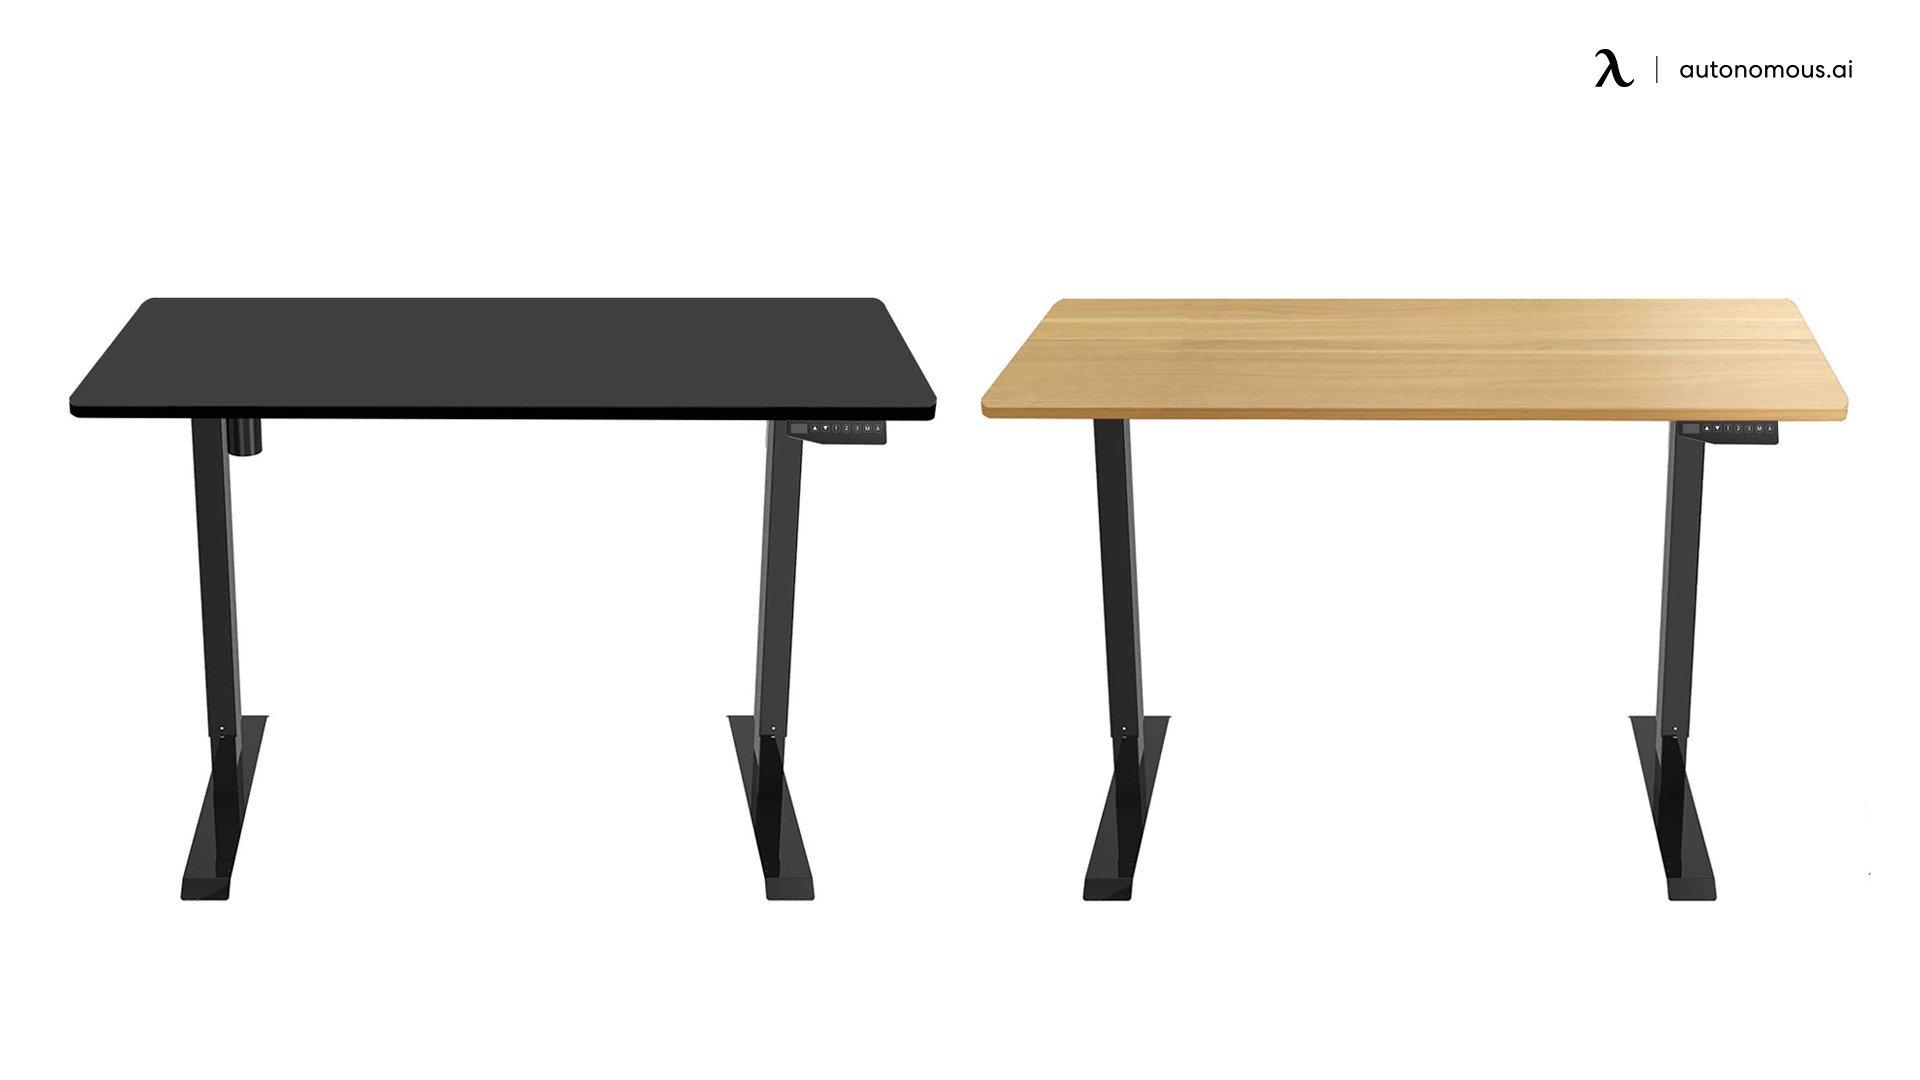 FlexiSpot EN1B Electric Sit-Stand Desk